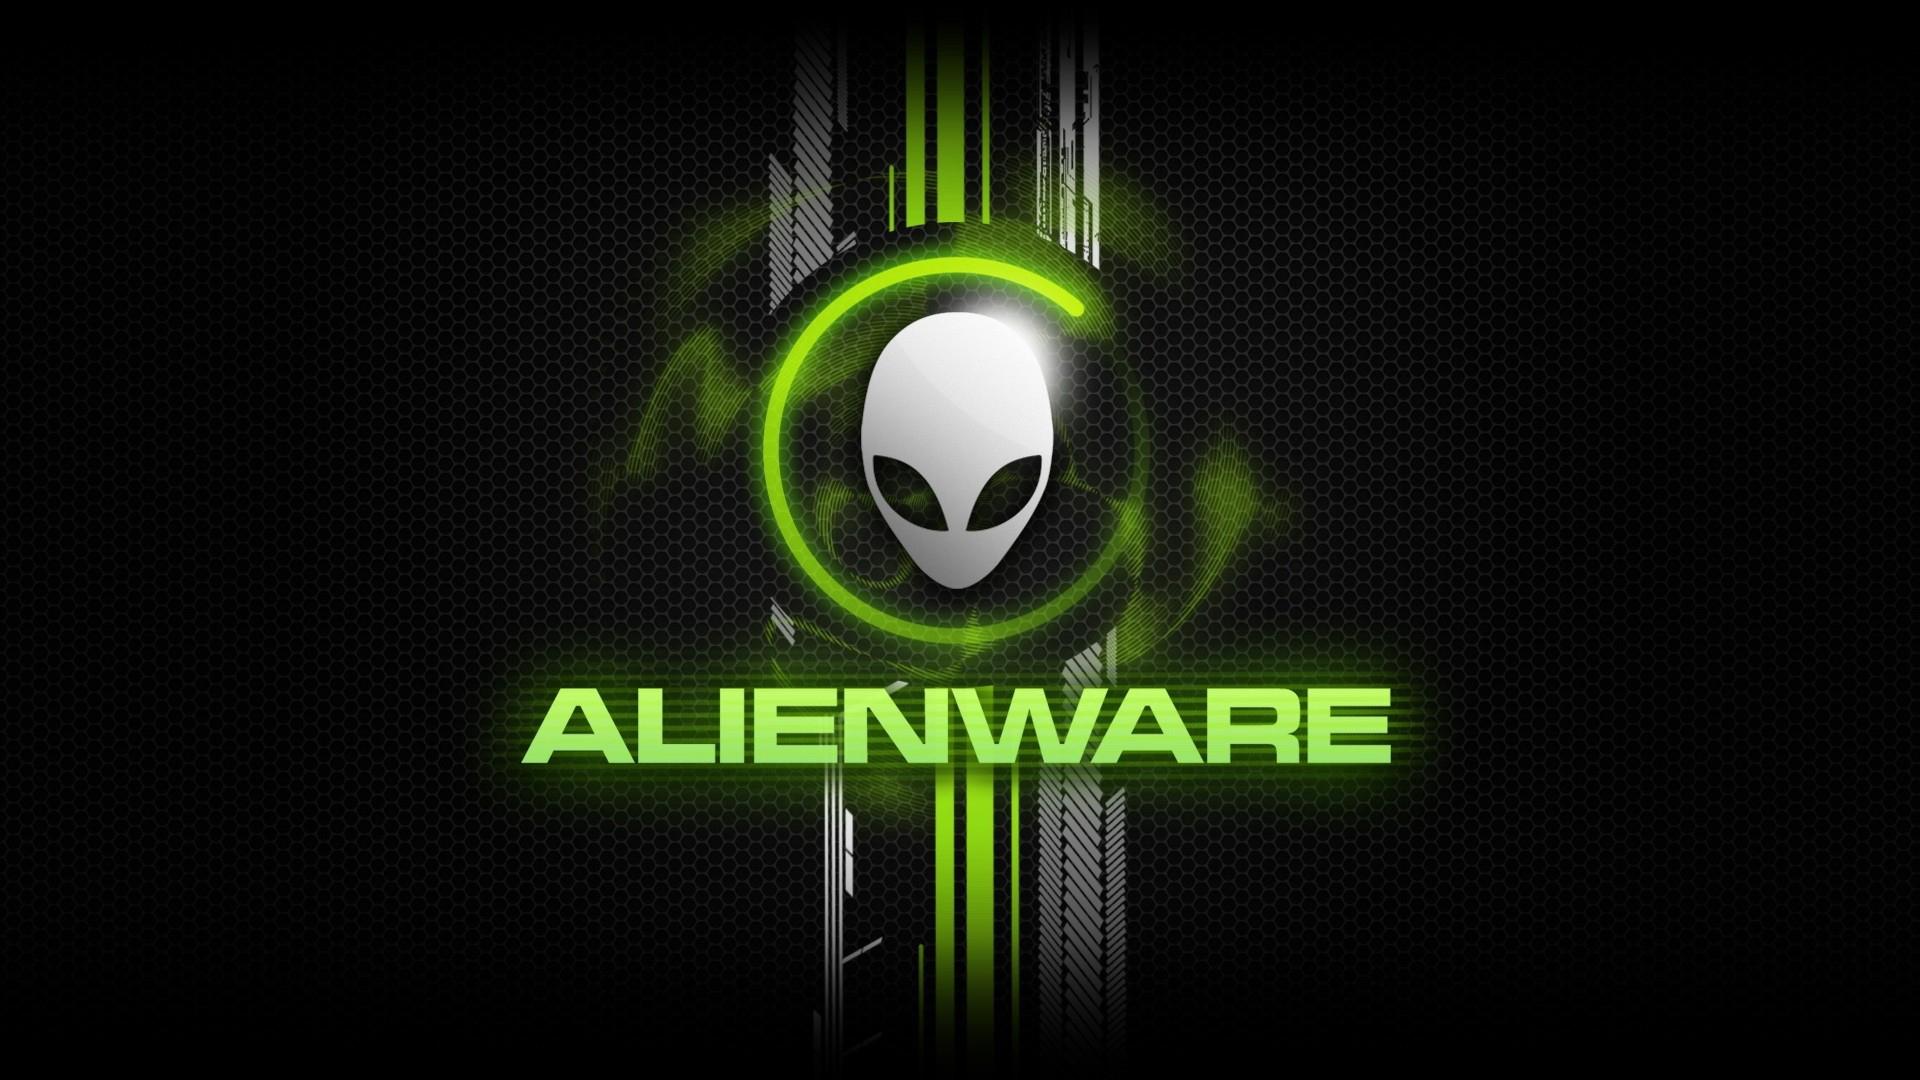 alienware wallpaper green hd - photo #24